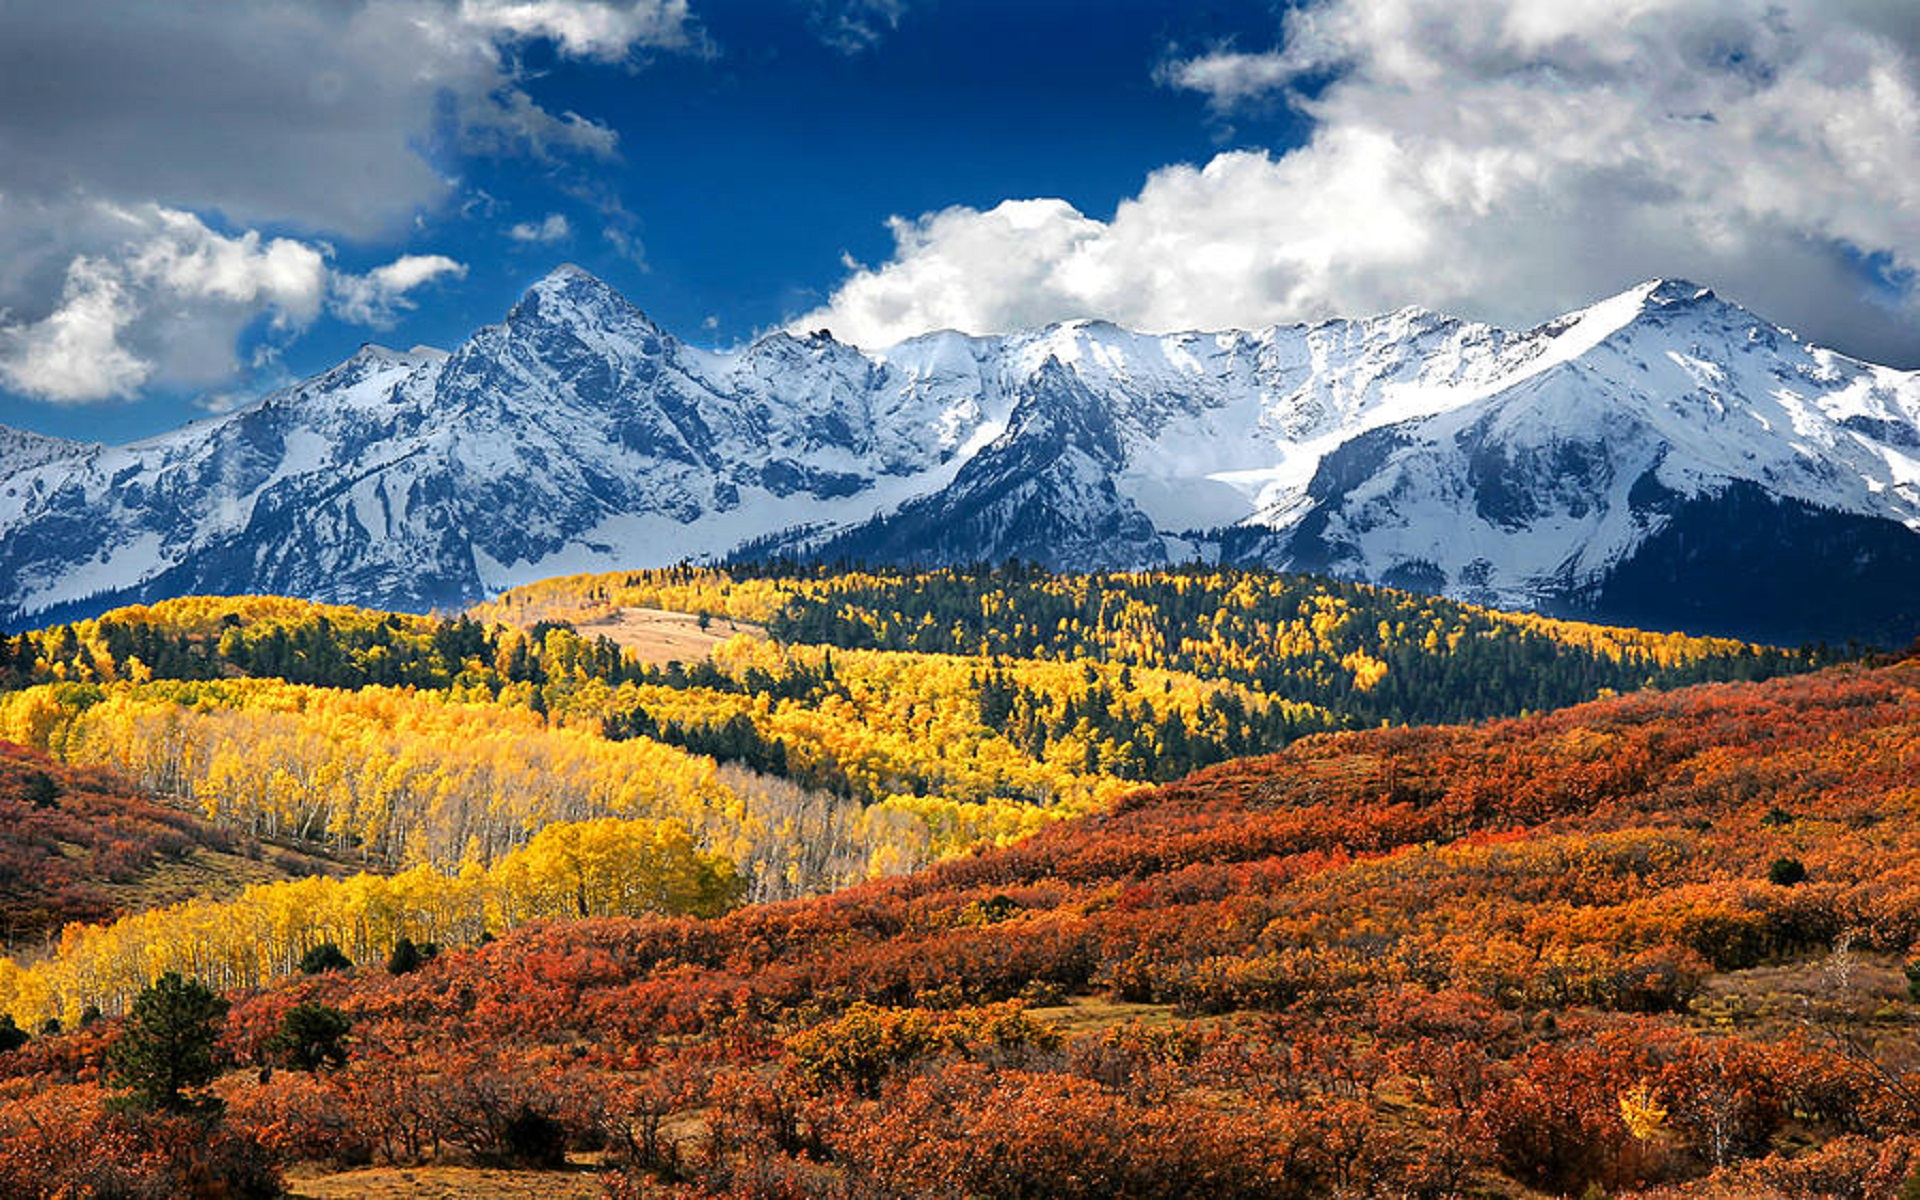 Colorado mountains hd wallpaper wallpapersafari - Colorado desktop background ...